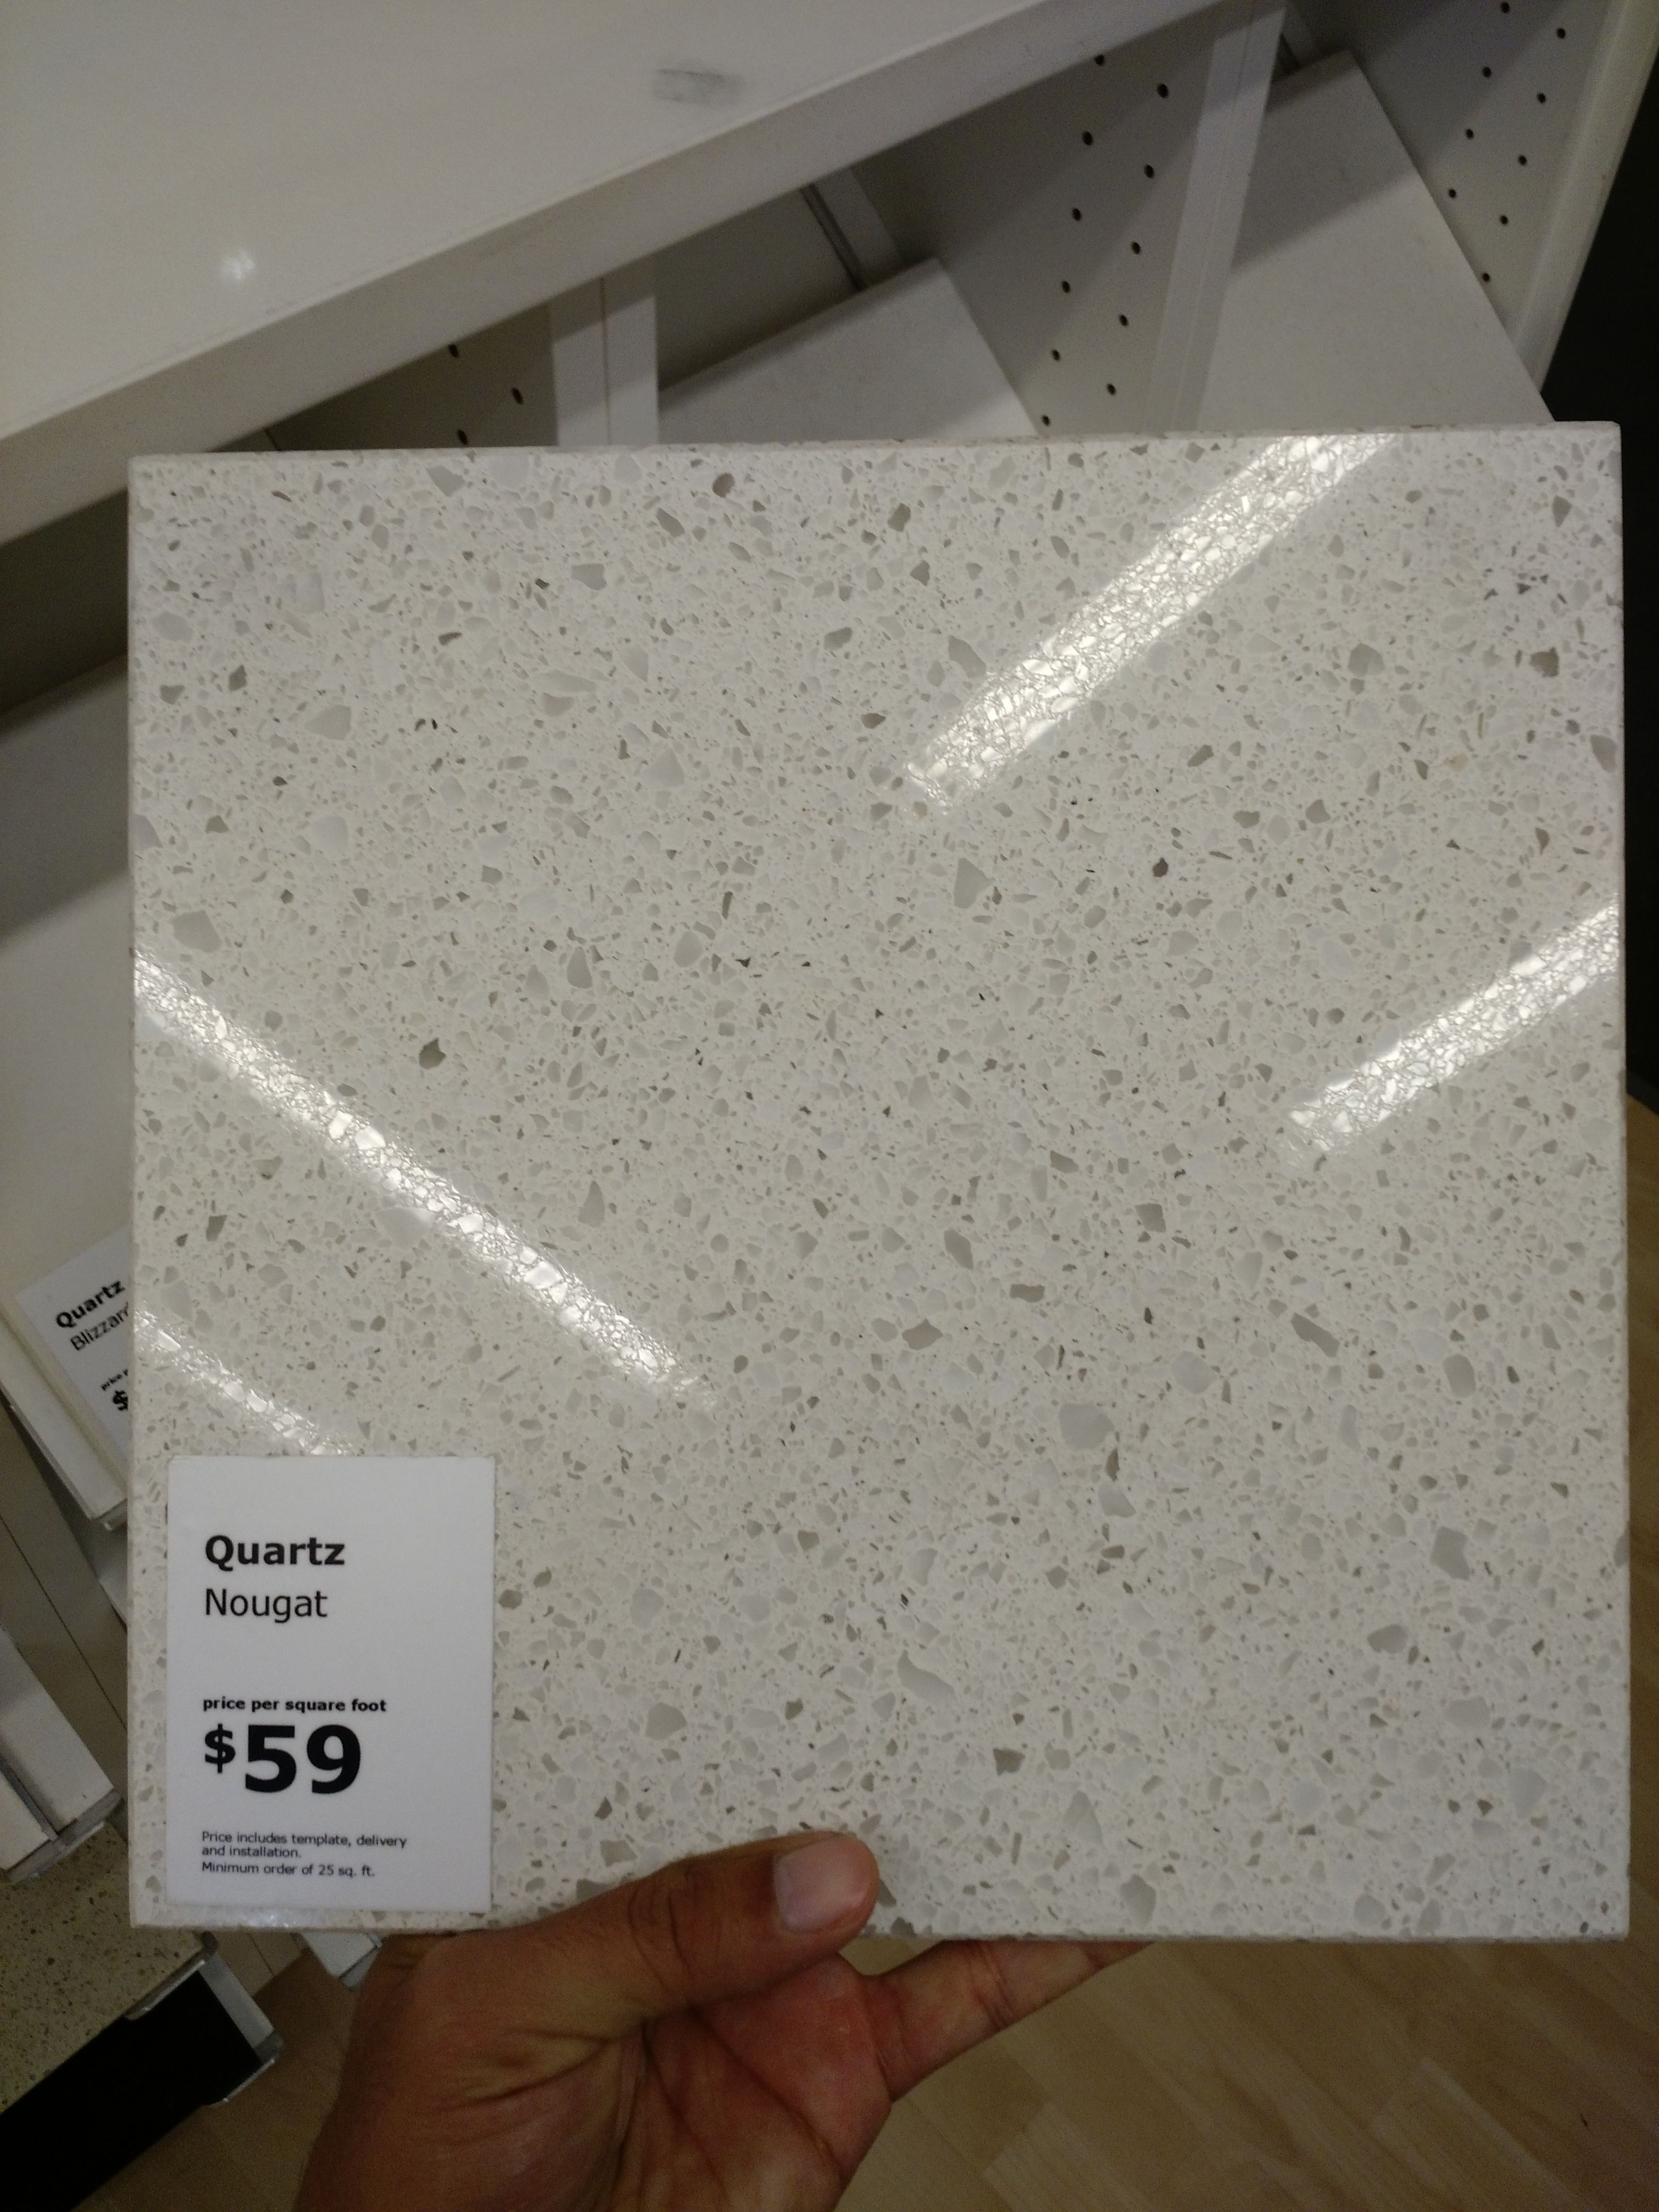 Ikea Quartz Countertop Kitchen Remodel Pinterest Countertop And Kitchens